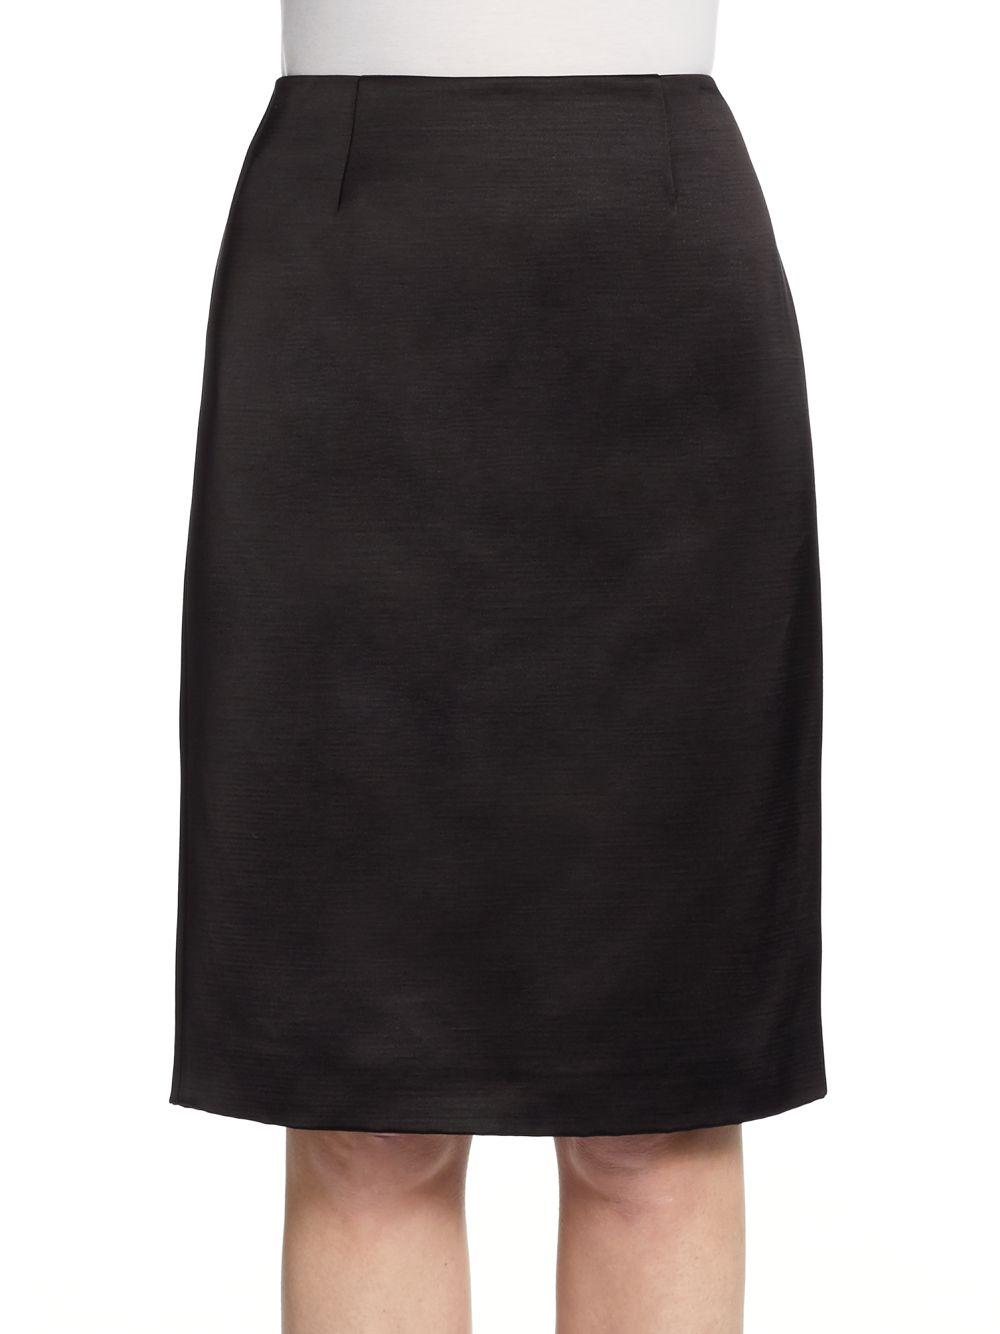 calvin klein satin pencil skirt in black lyst